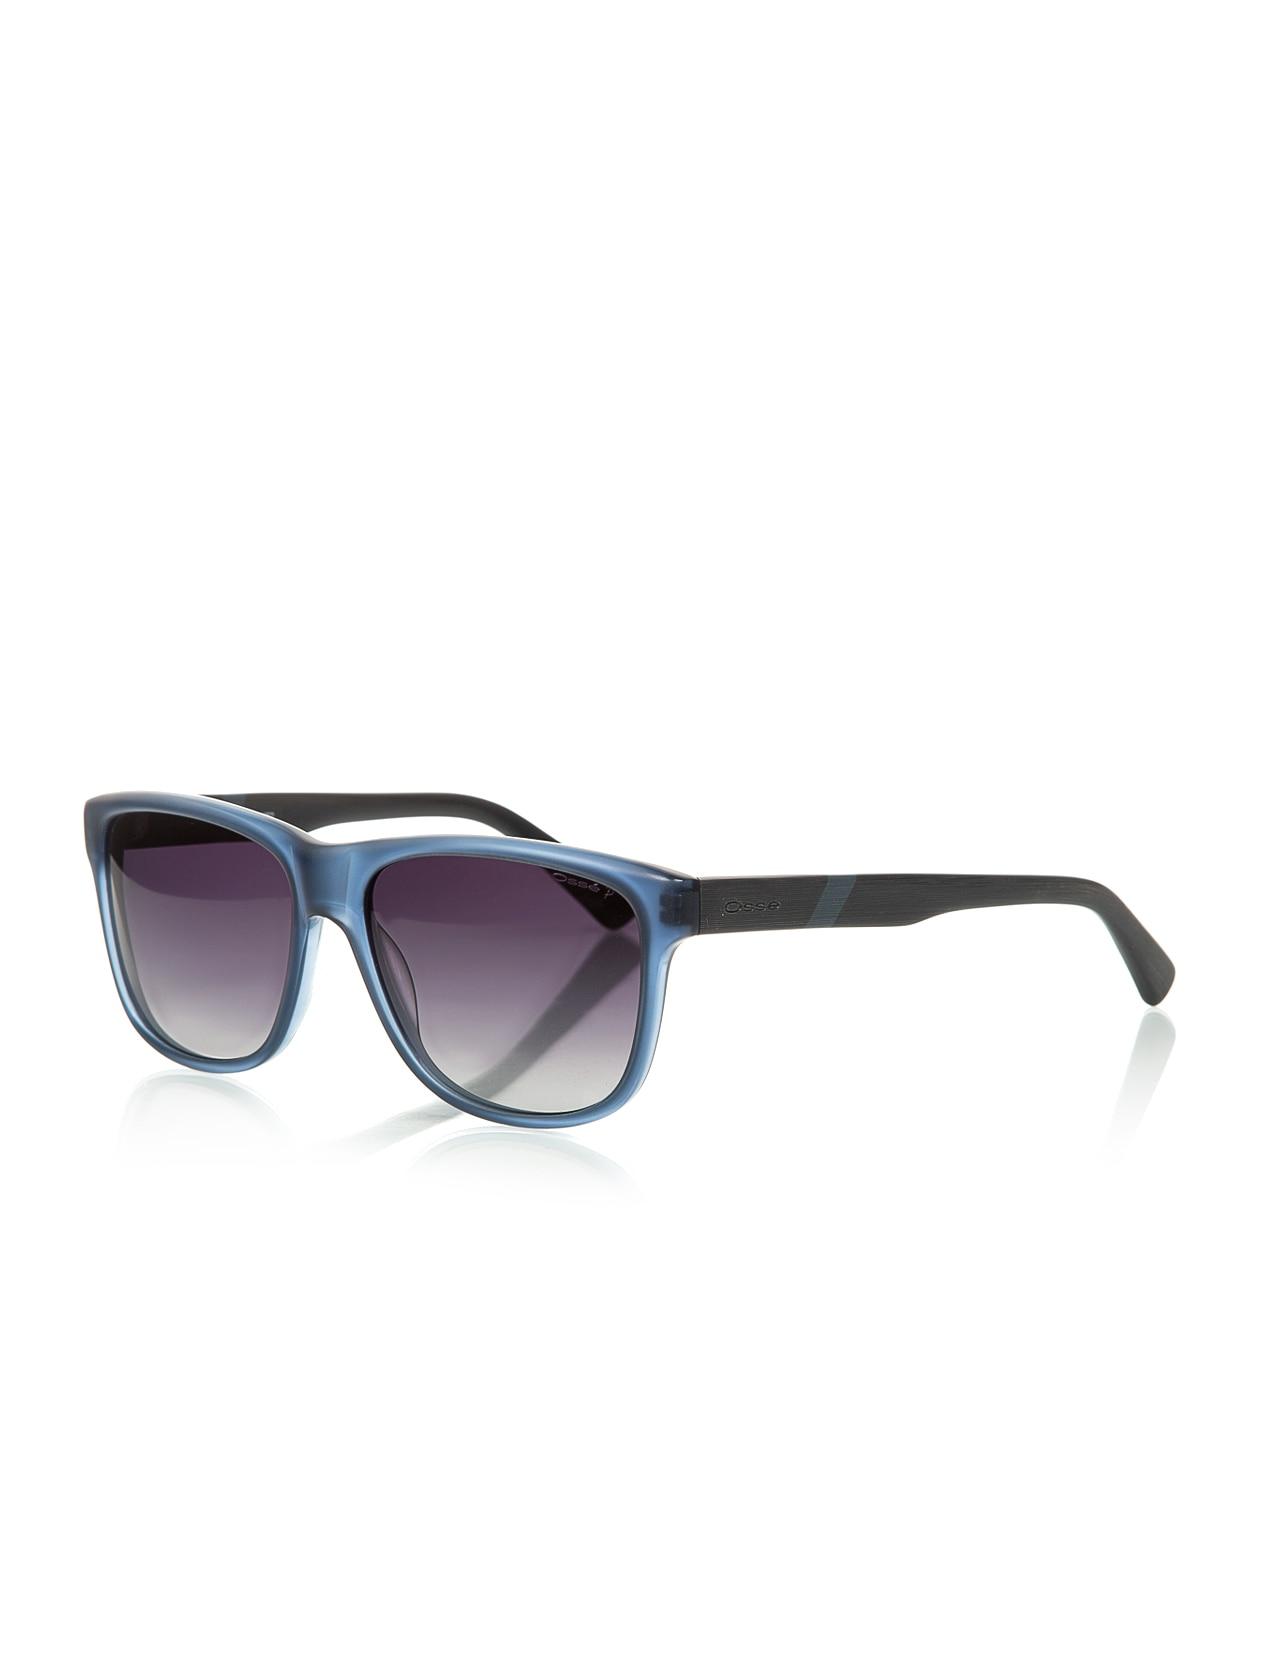 Unisex sunglasses os 2023 02 bone blue organic square square 57-16-145 osse